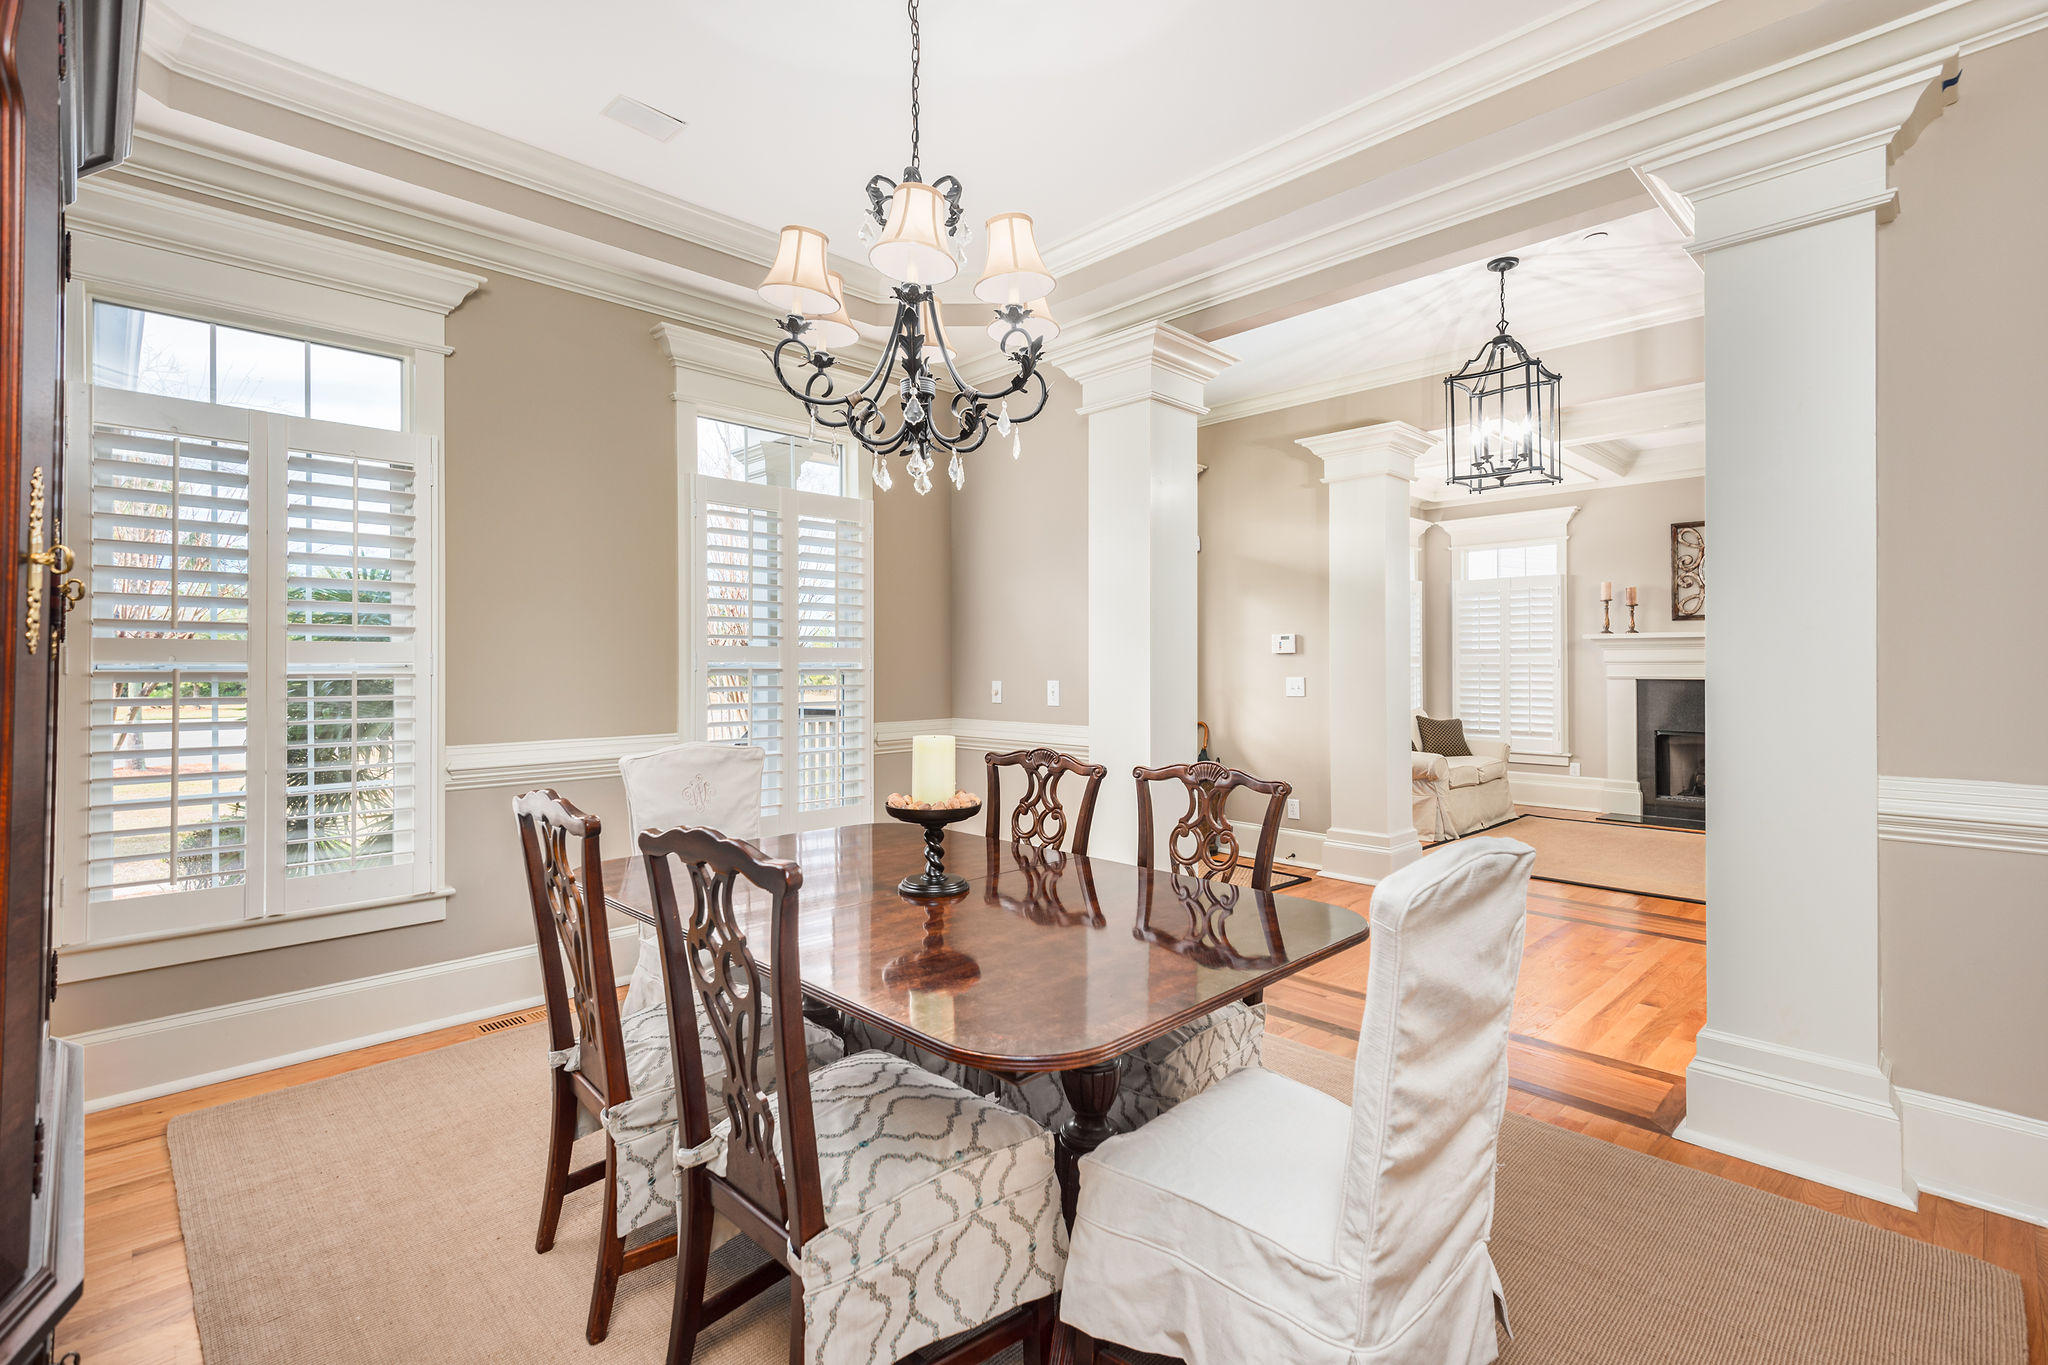 Dunes West Homes For Sale - 1305 King Bird, Mount Pleasant, SC - 45